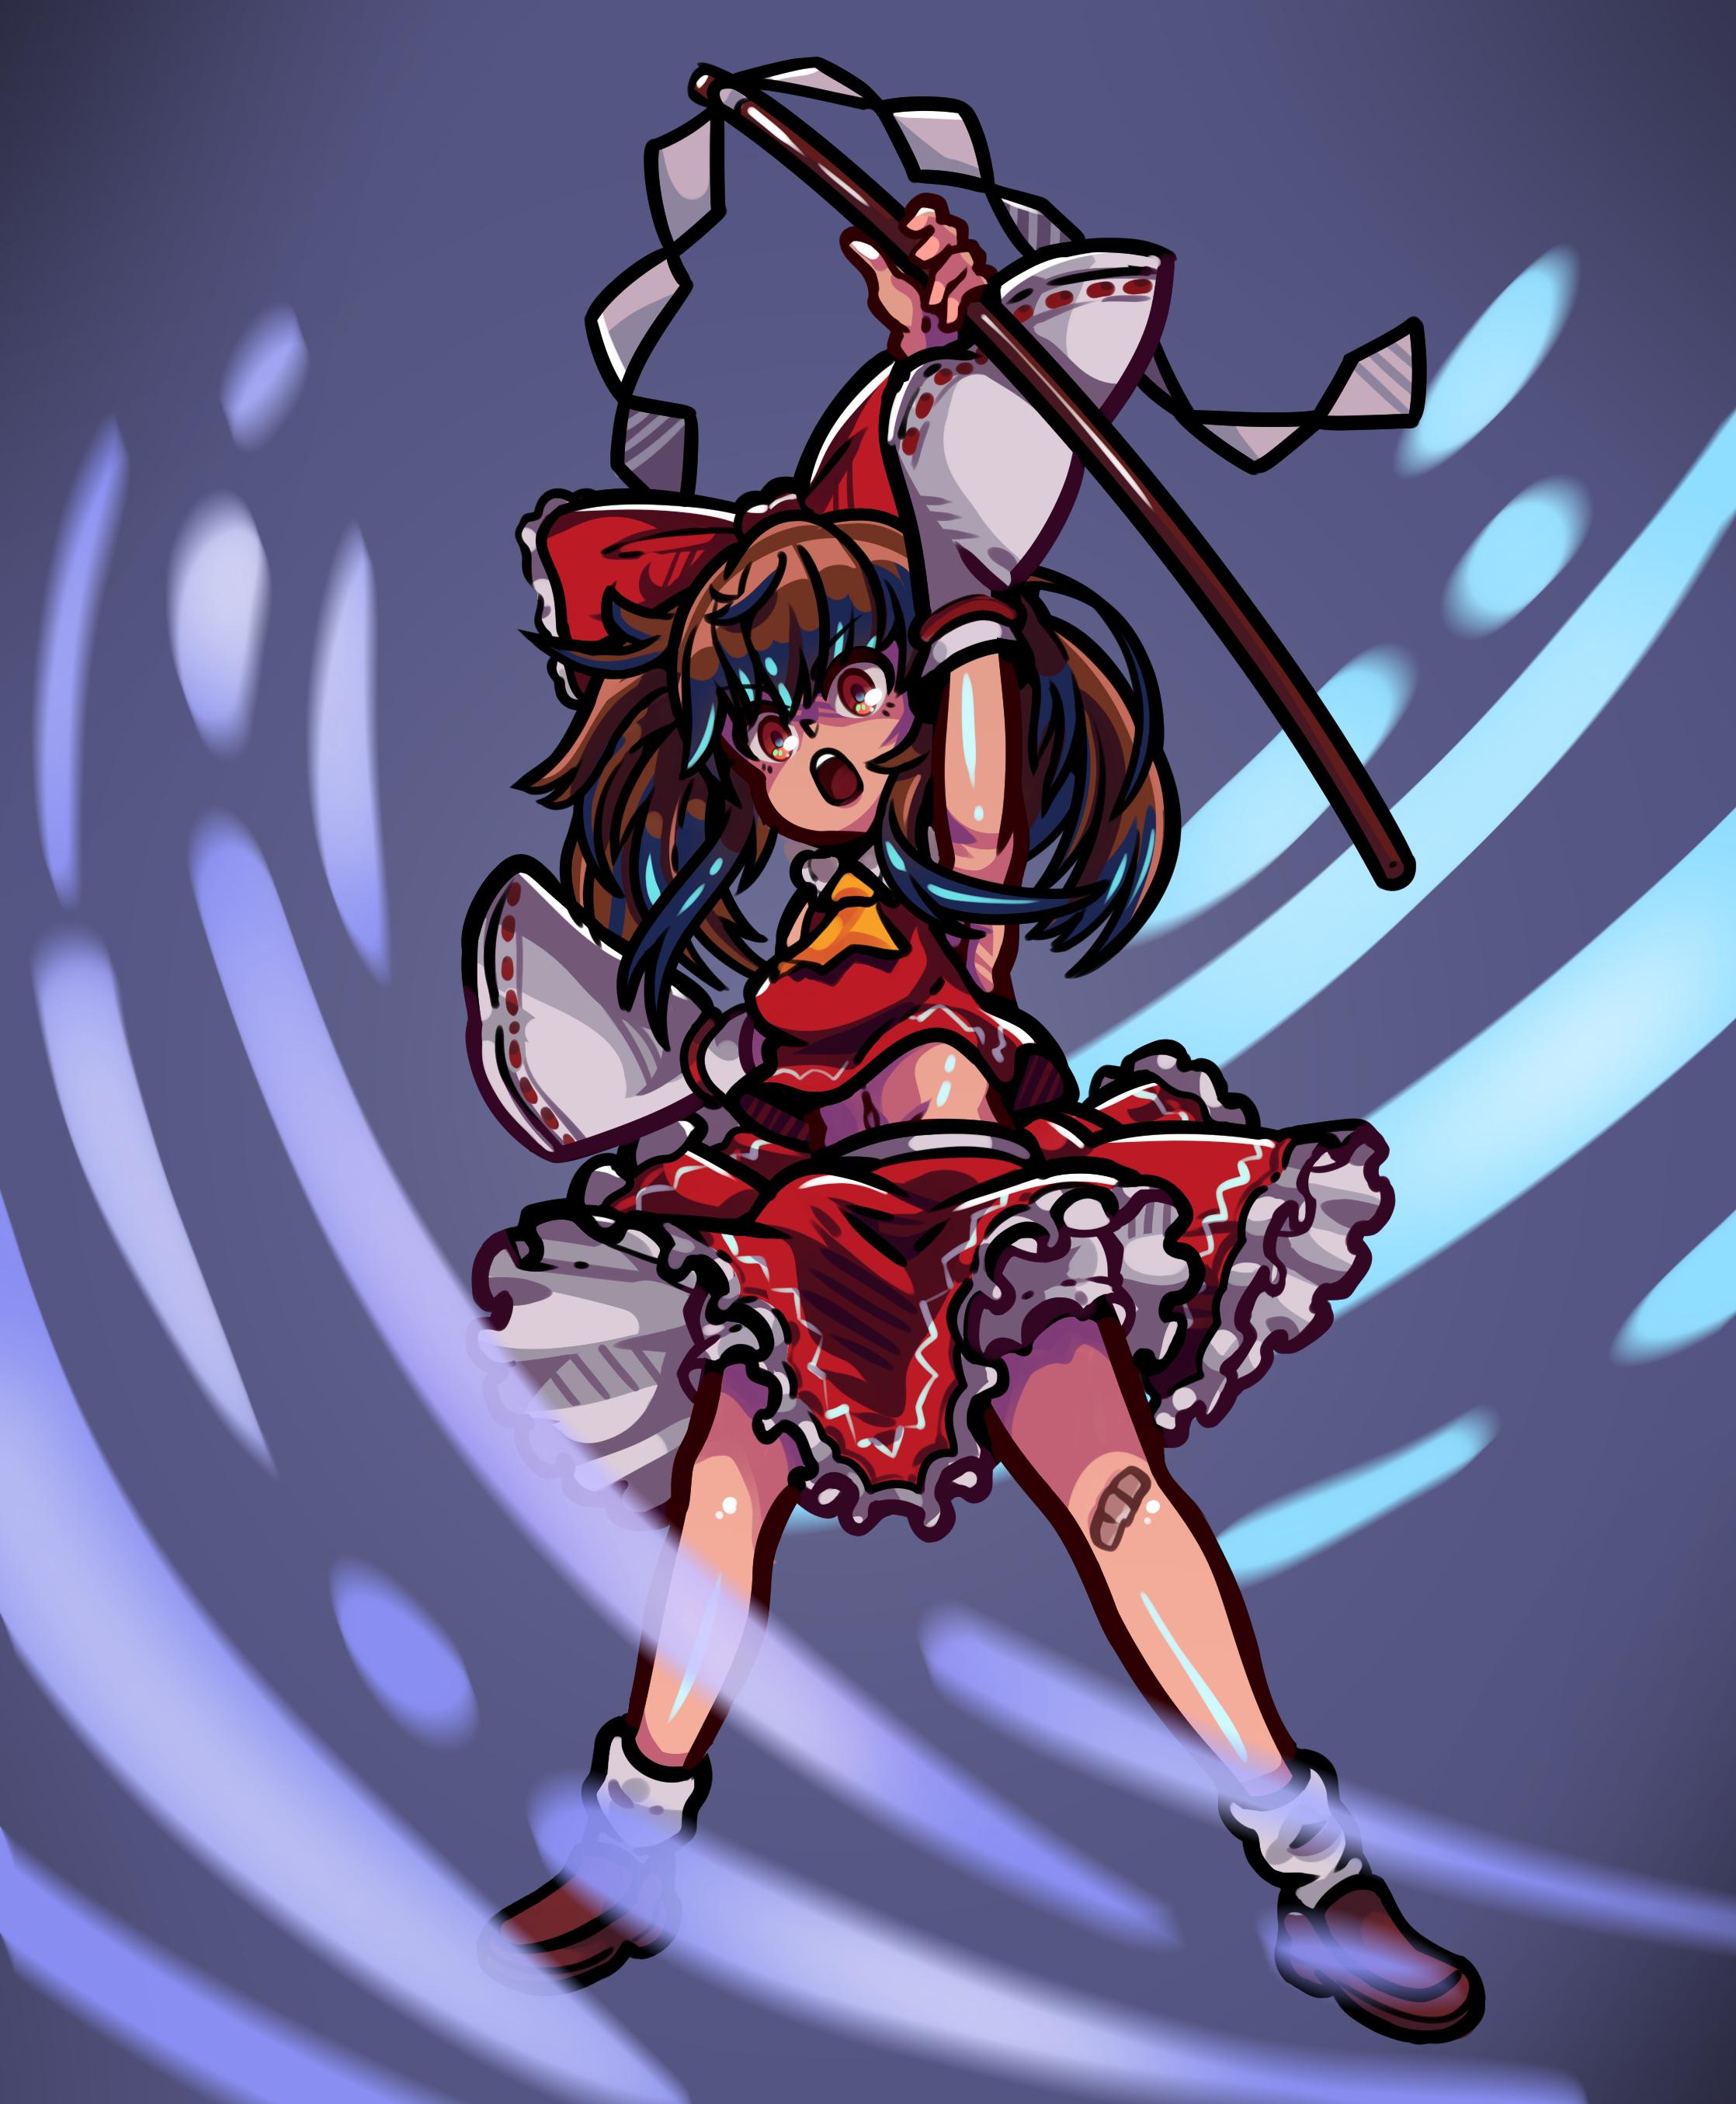 The Angry Reimu